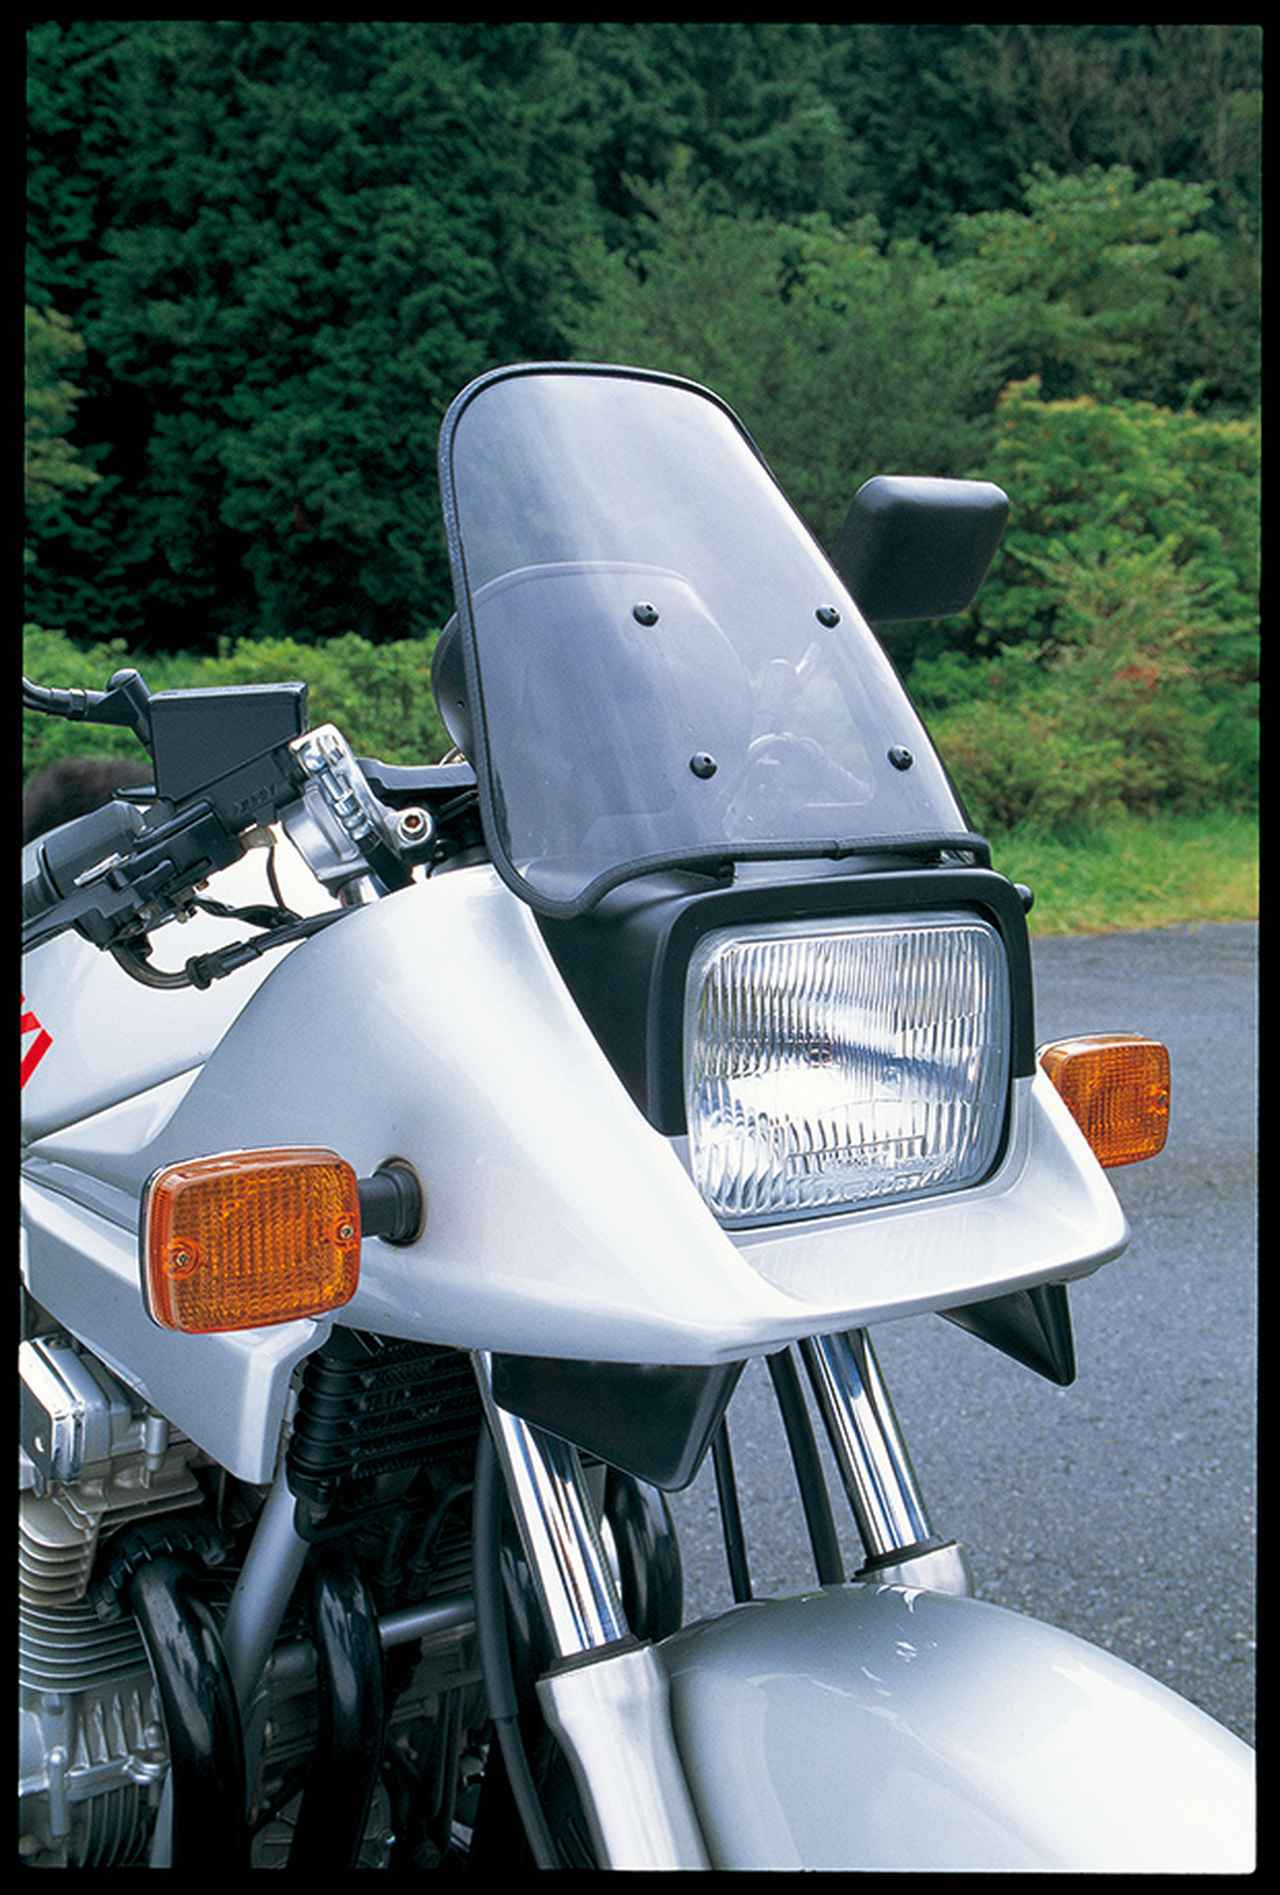 Images : 3番目の画像 - GSX 1100 S KATANA - webオートバイ